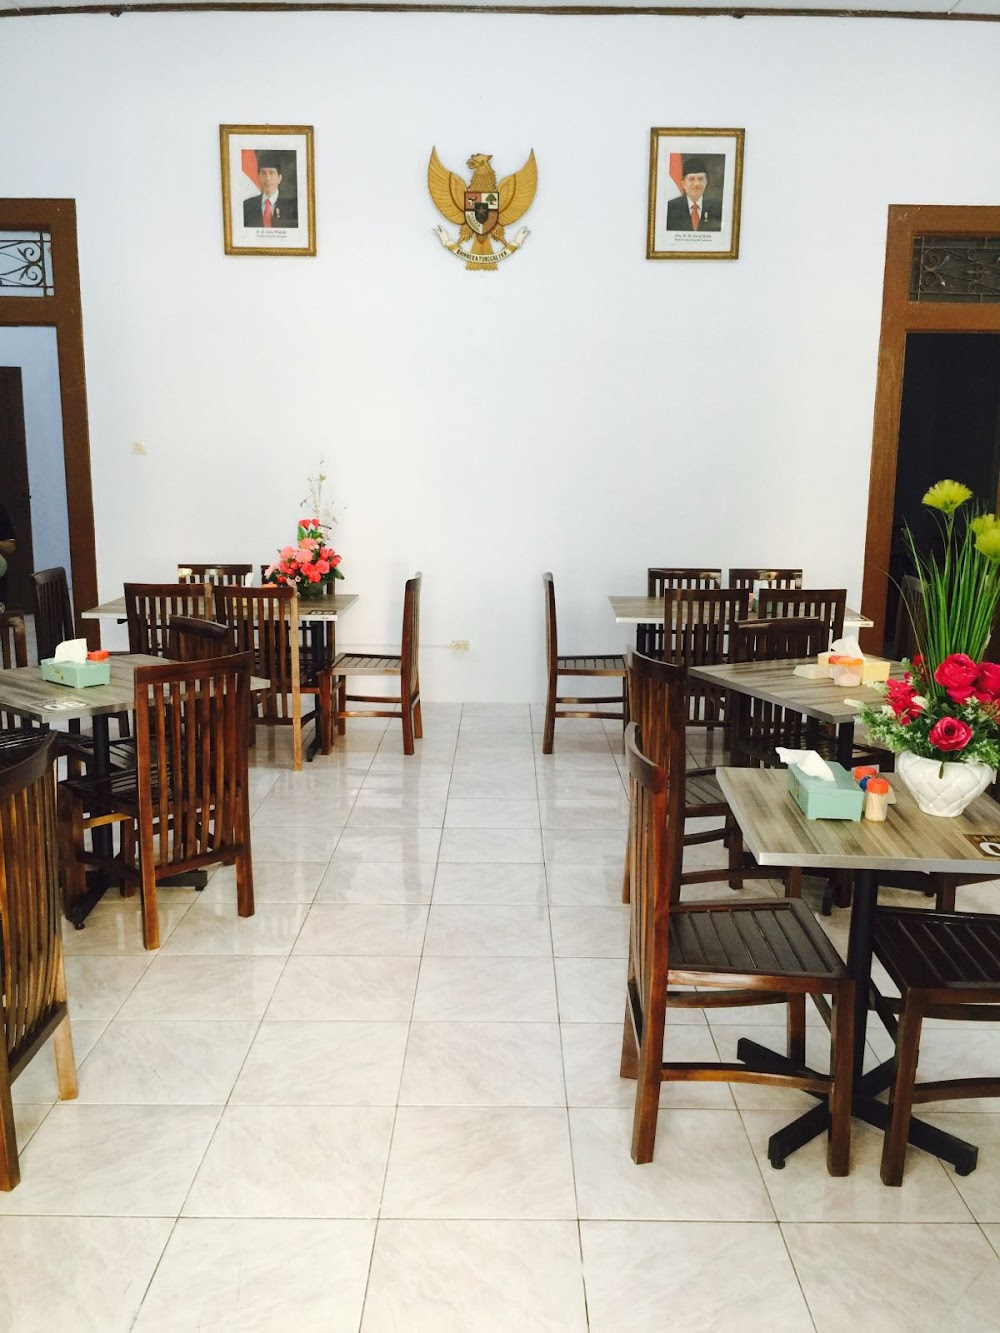 Warkop Lakopi 62 411 3690763 Jl Lombok No 17 Pattunuang Wajo Kota Makassar Sulawesi Selatan 90173 Indonesia